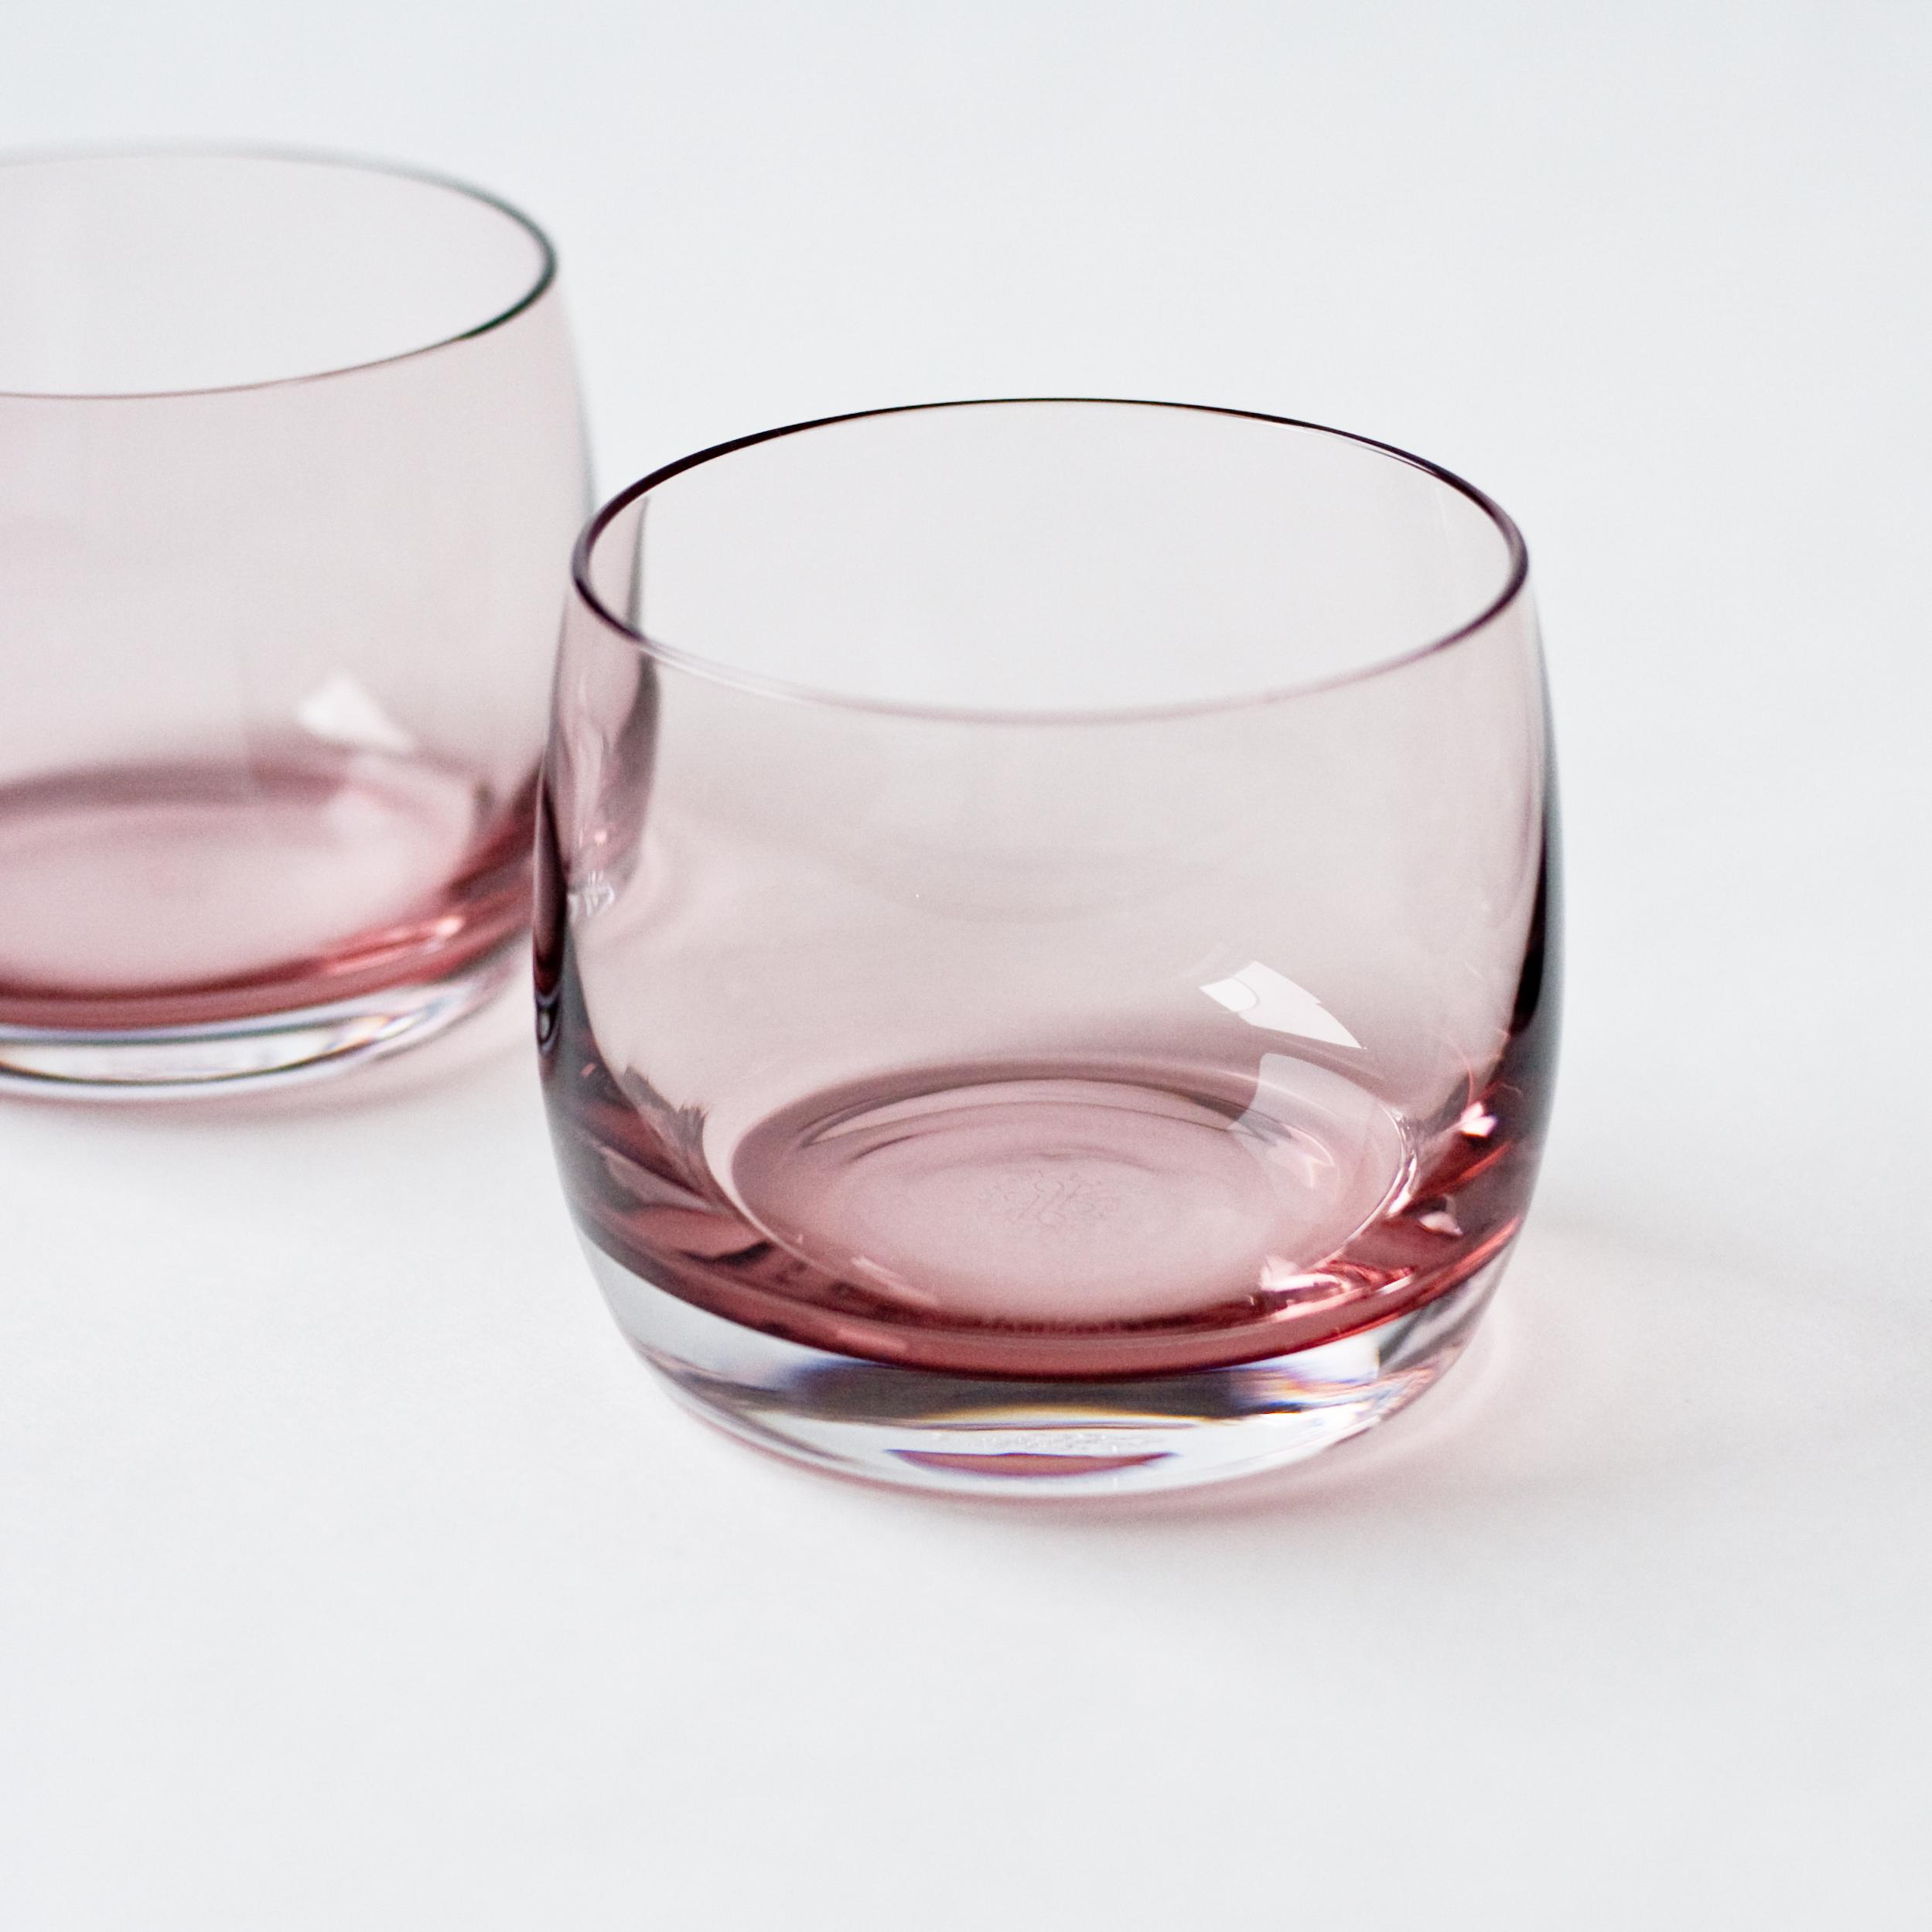 Lej Axel Brüel vandglas fra Lyngby Porcelæn hos A table story